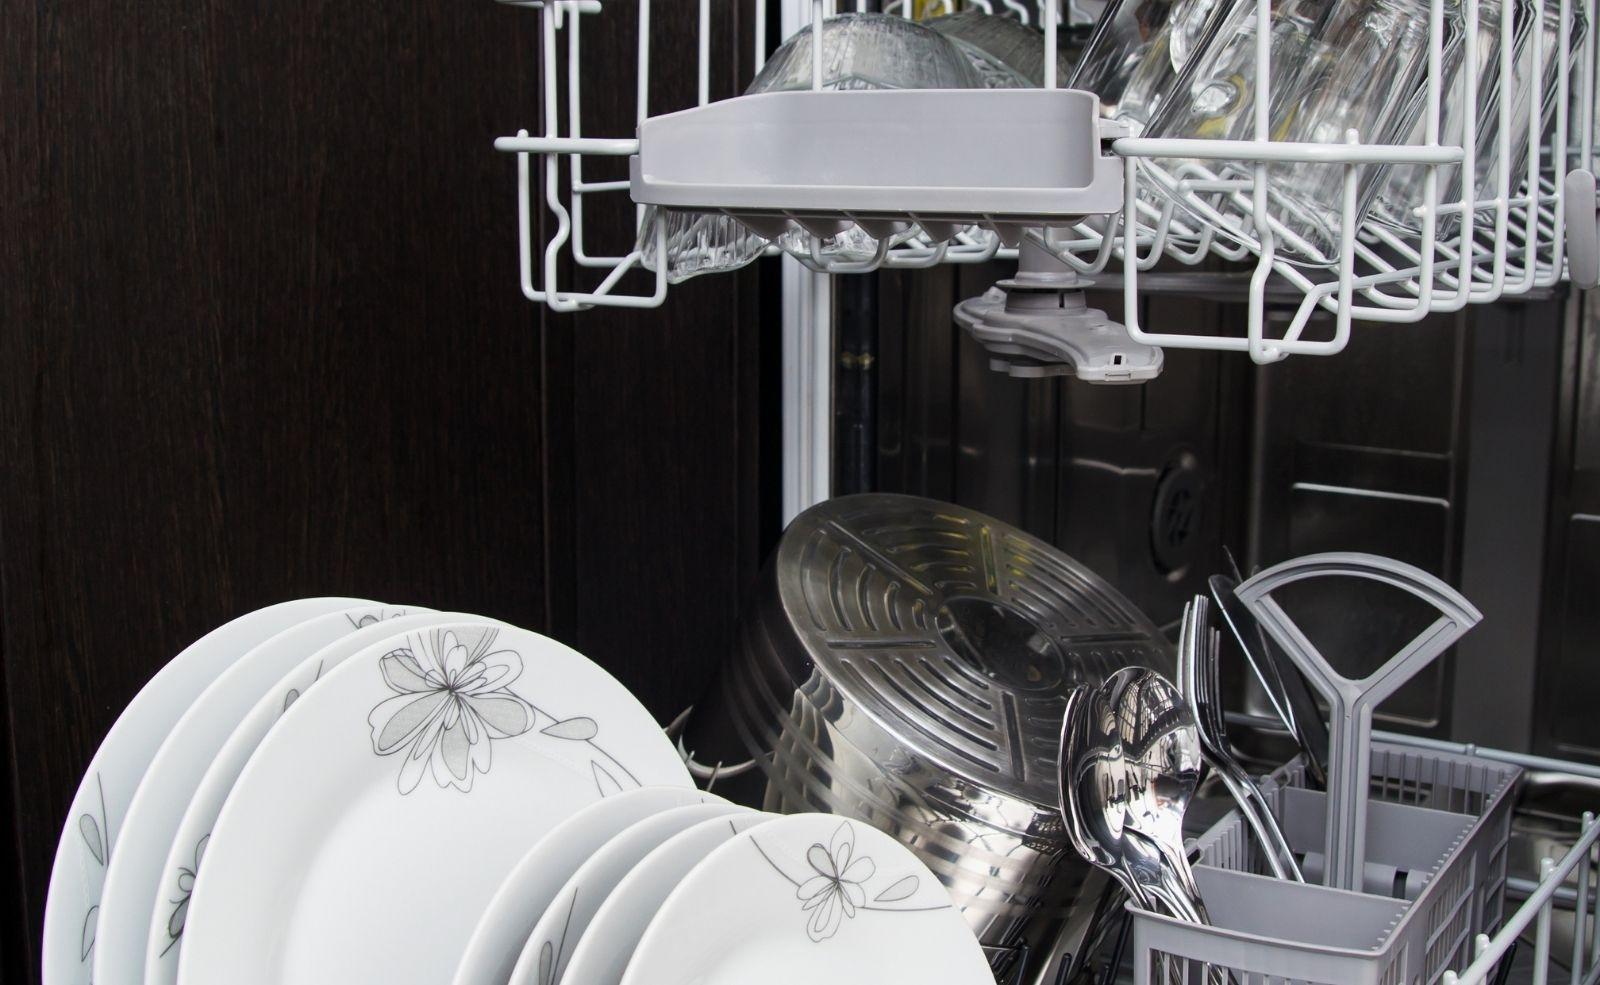 Geschirrspüler Spülmaschine Wärmetauscher reinigen